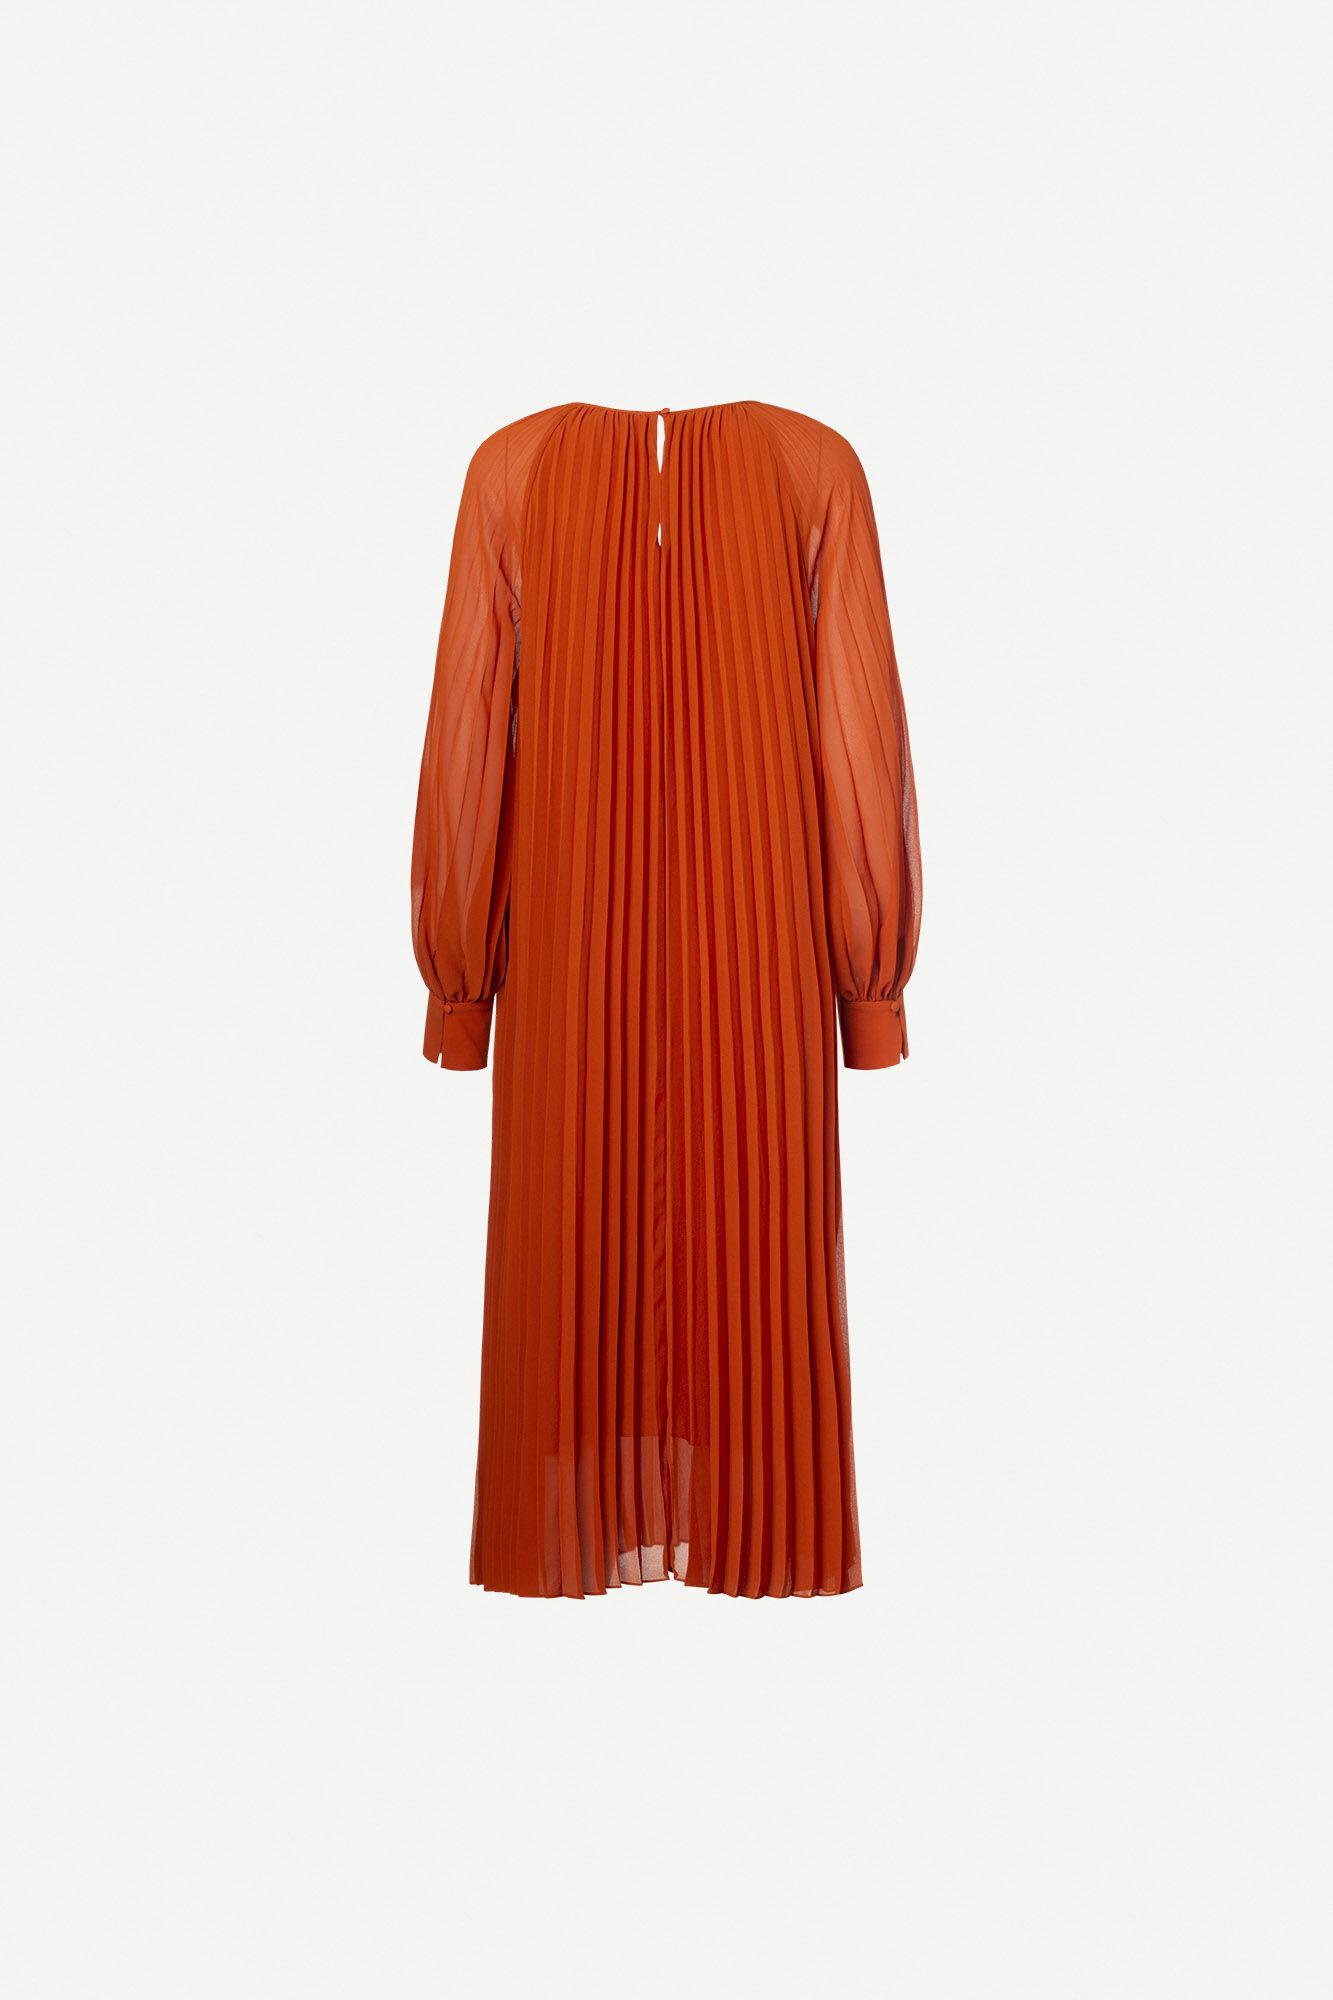 Annmari dress 6621